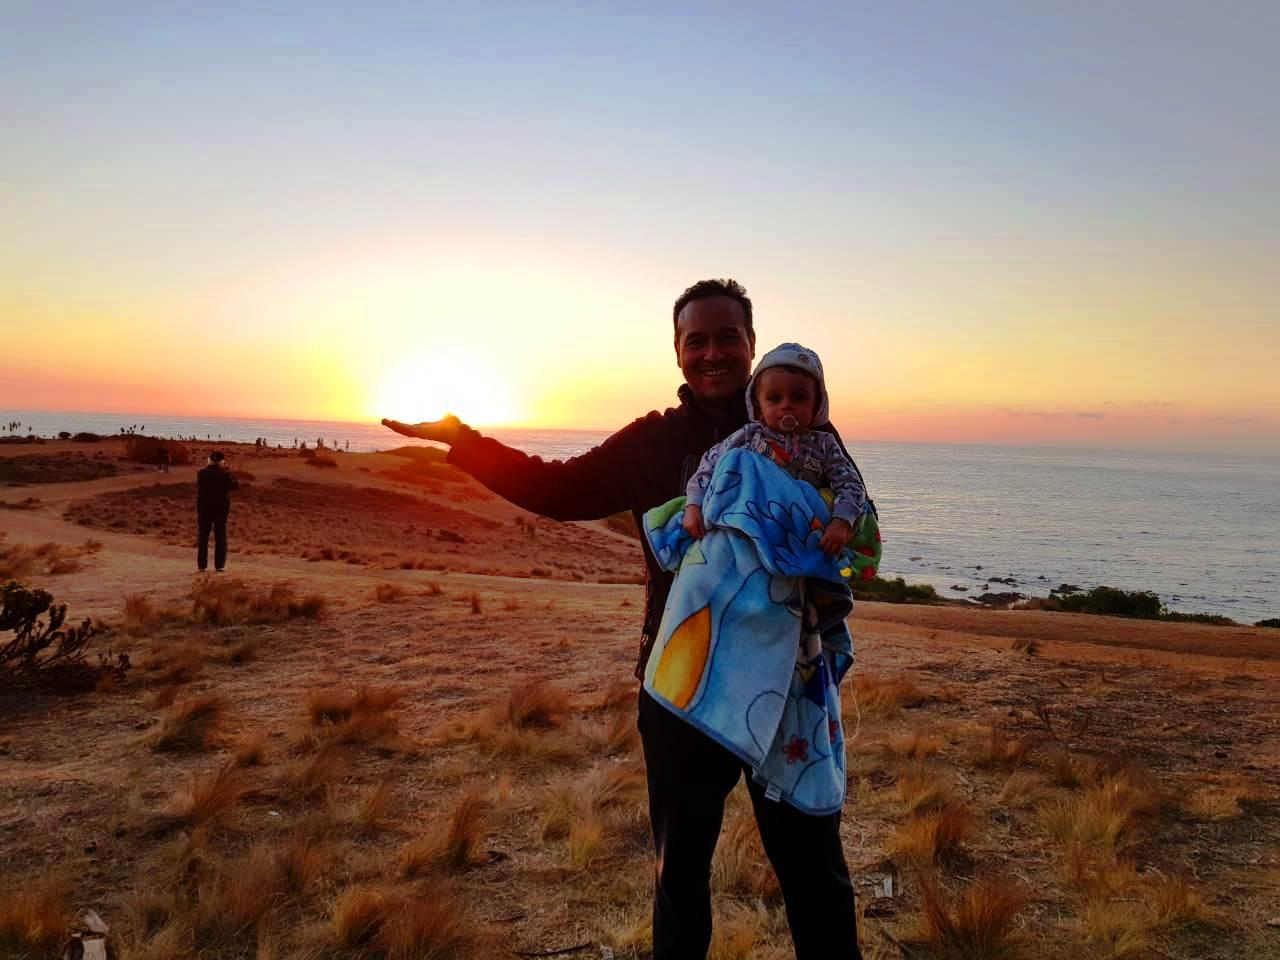 Pôr do sol em Algarrobo, El Canelo Chile, LikeChile